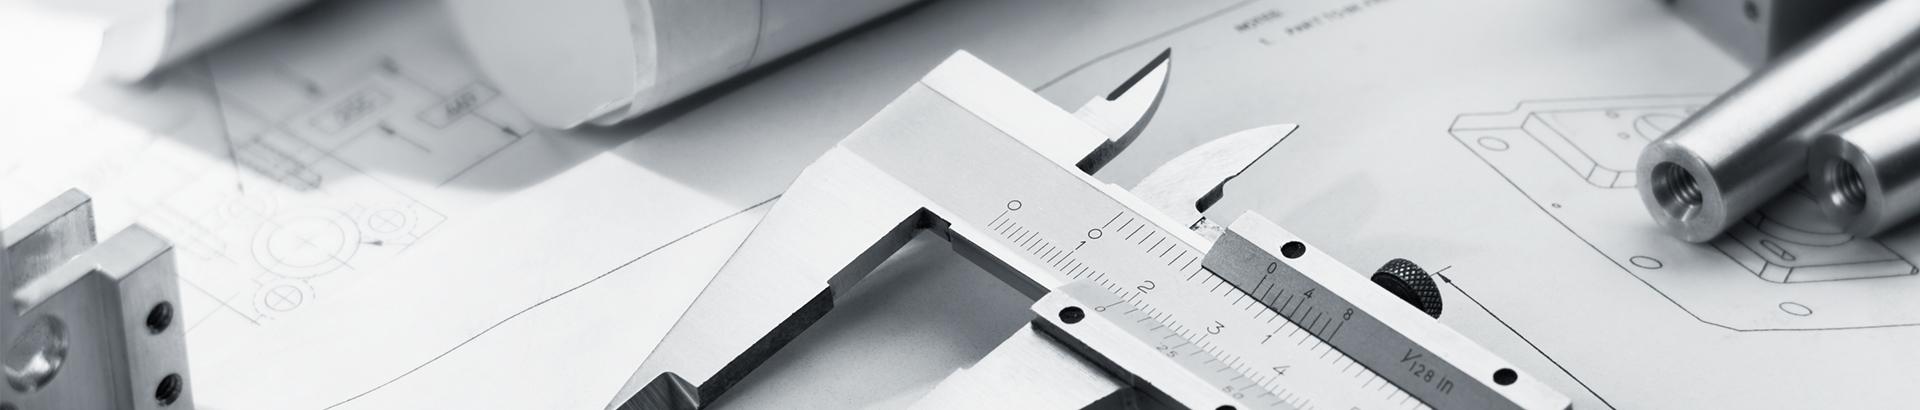 Flatness Inspection Method of Worktable